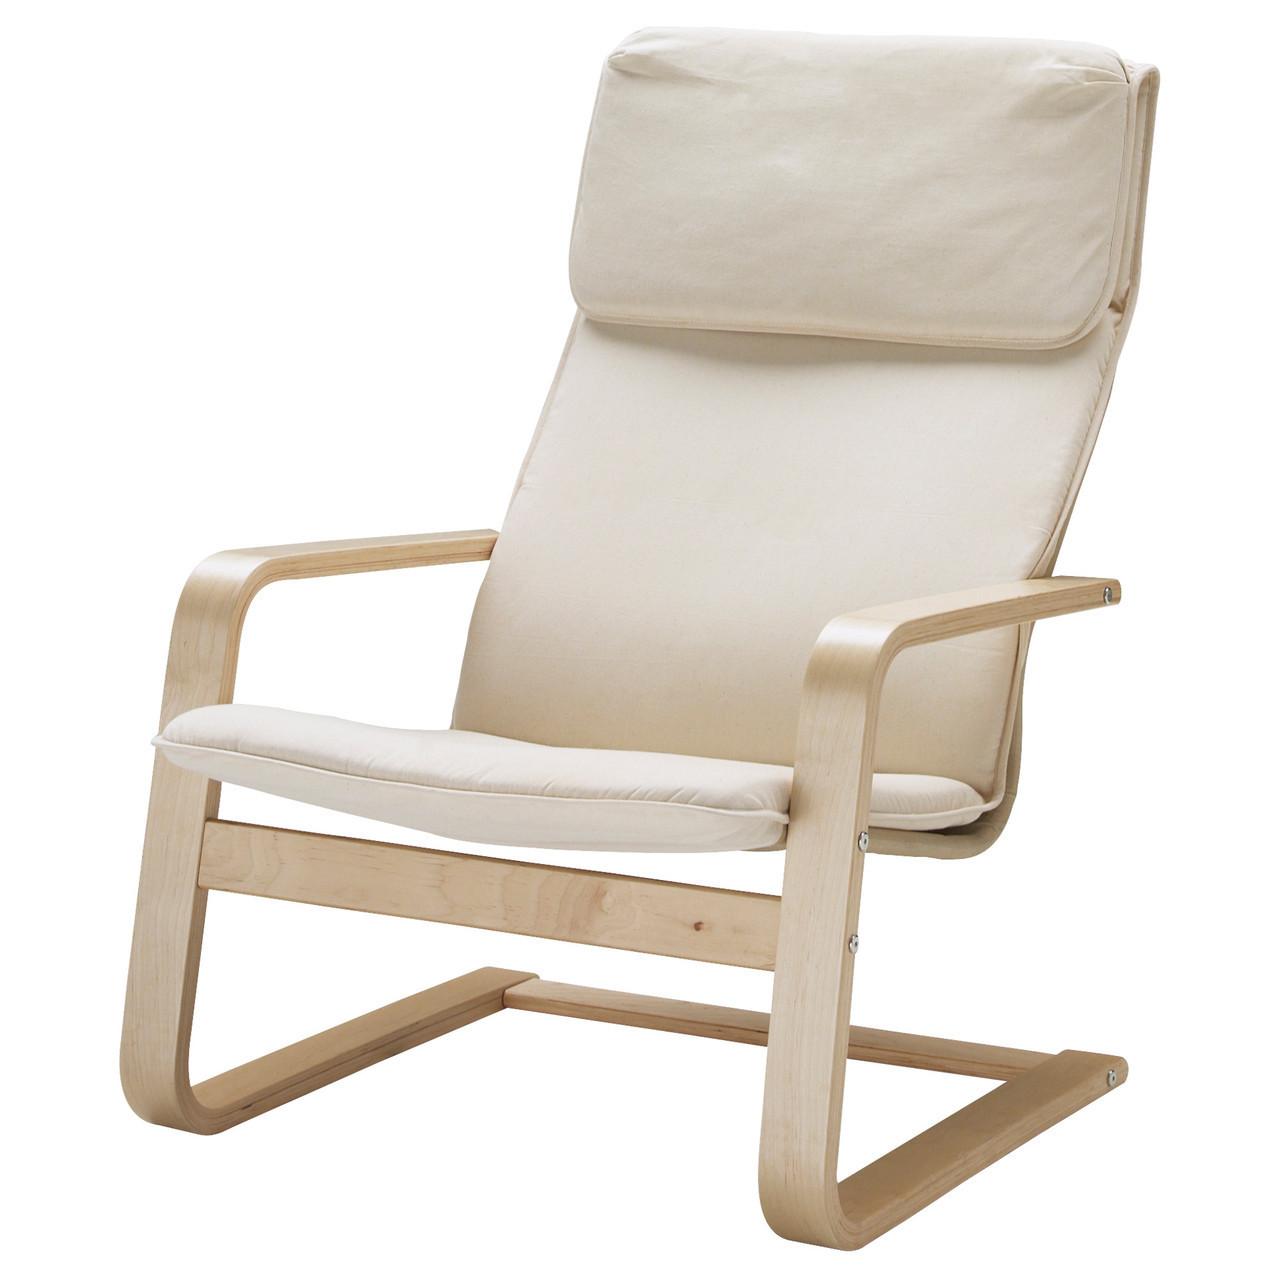 Кресло икеа PELLO, Хольмби неокрашенный, IKEA, 500.784.64